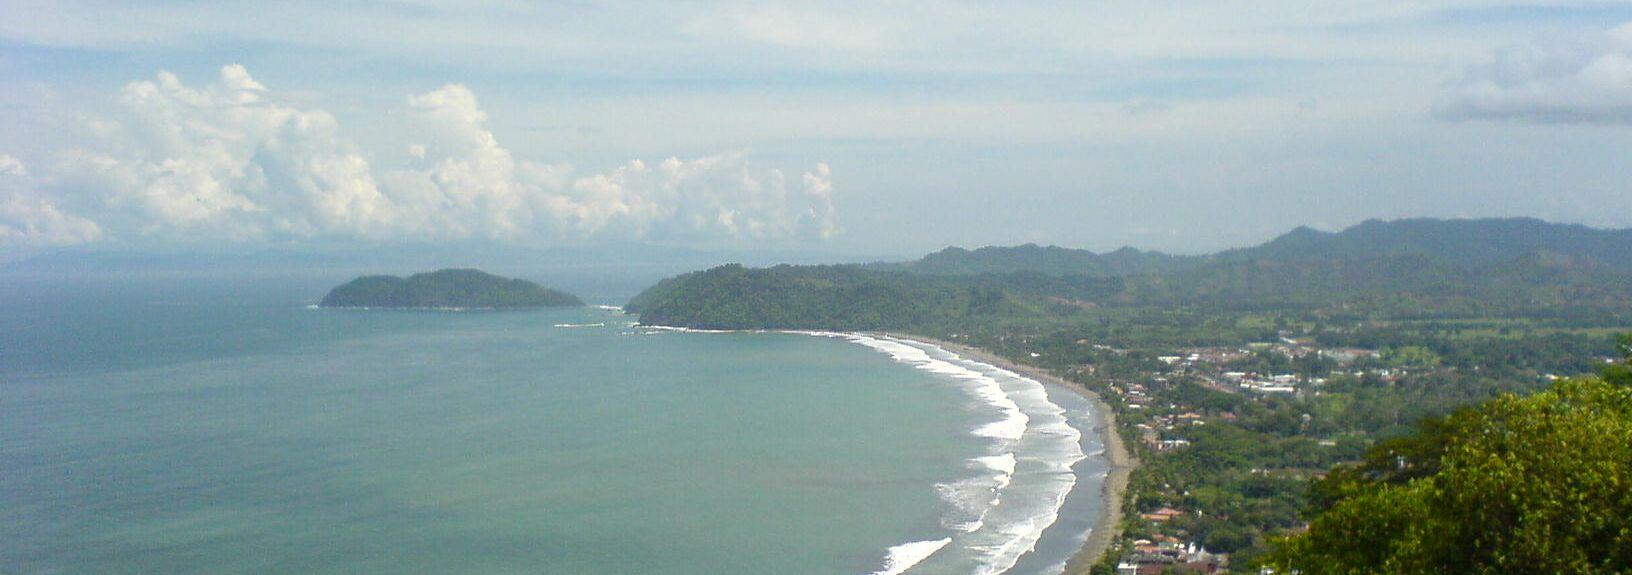 La Paloma Blanca, Jaco, Costa Rica